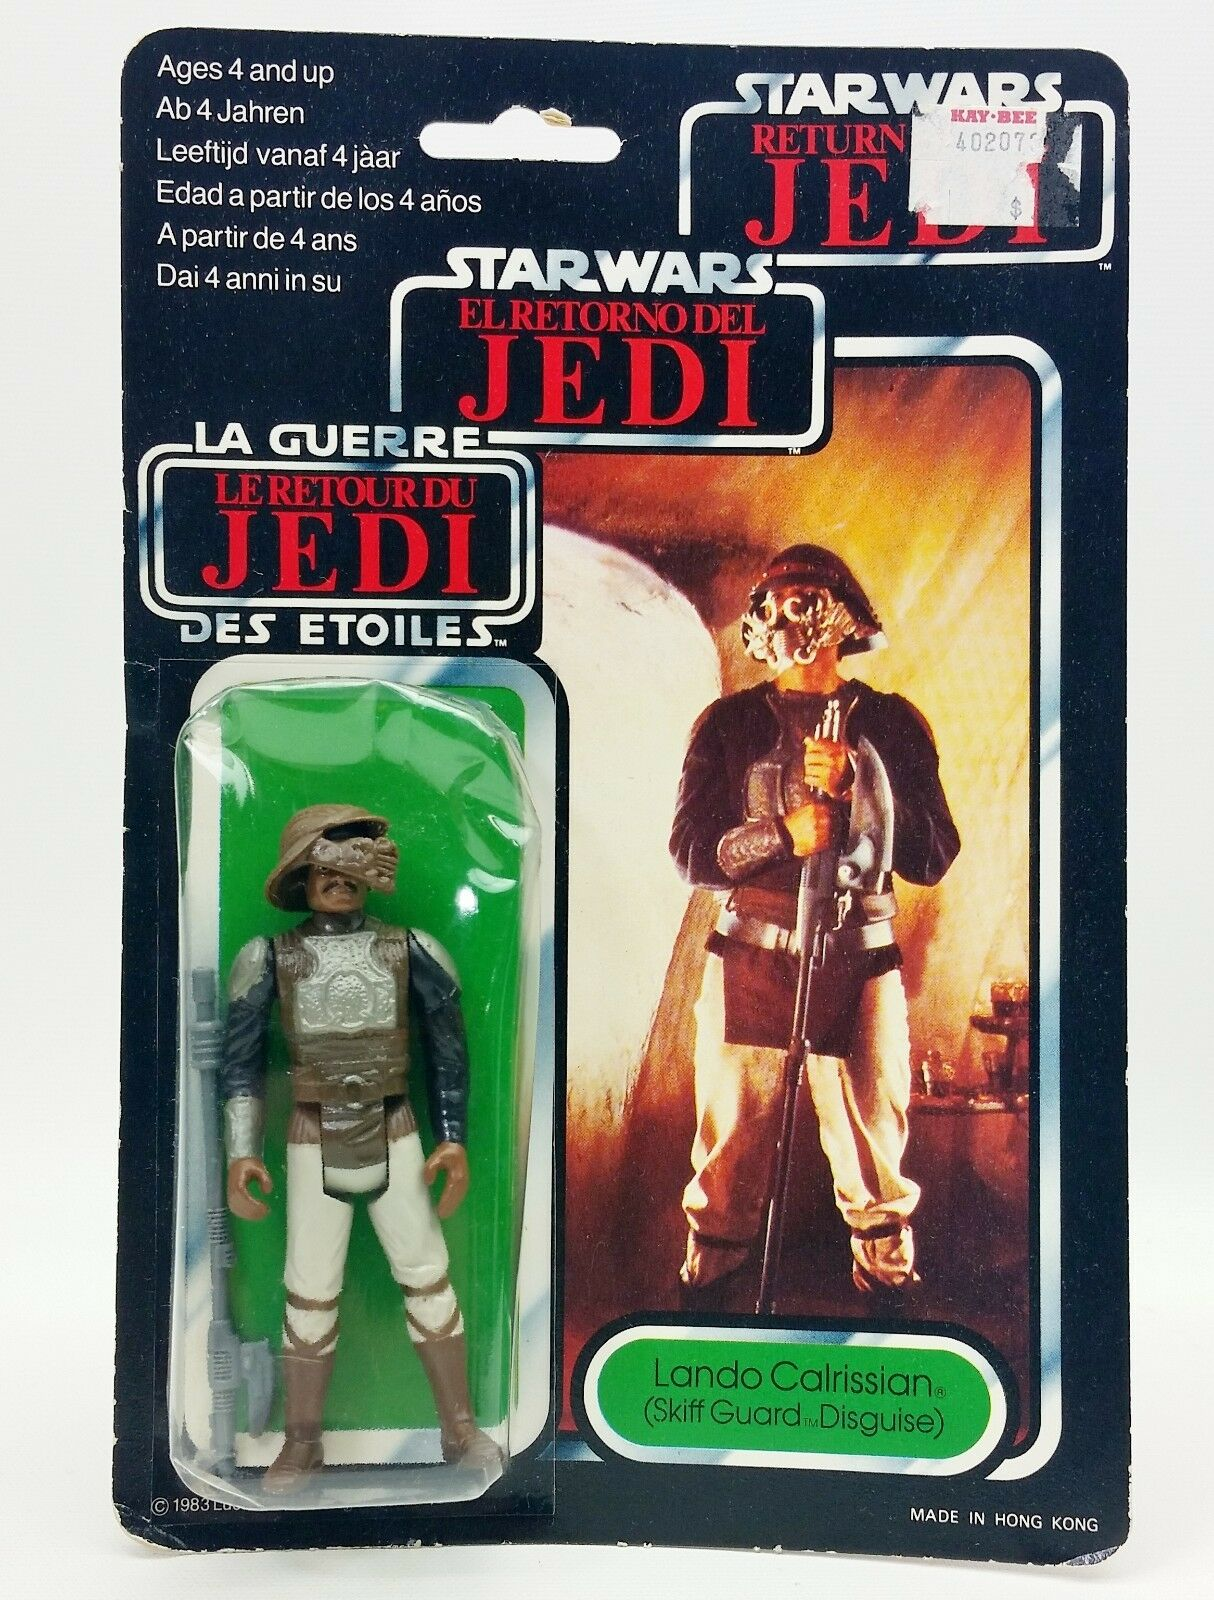 1983 Star Wars Return Of The Jedi Jedi Jedi Lando Calrissian Action Figure NRFP 545c7c